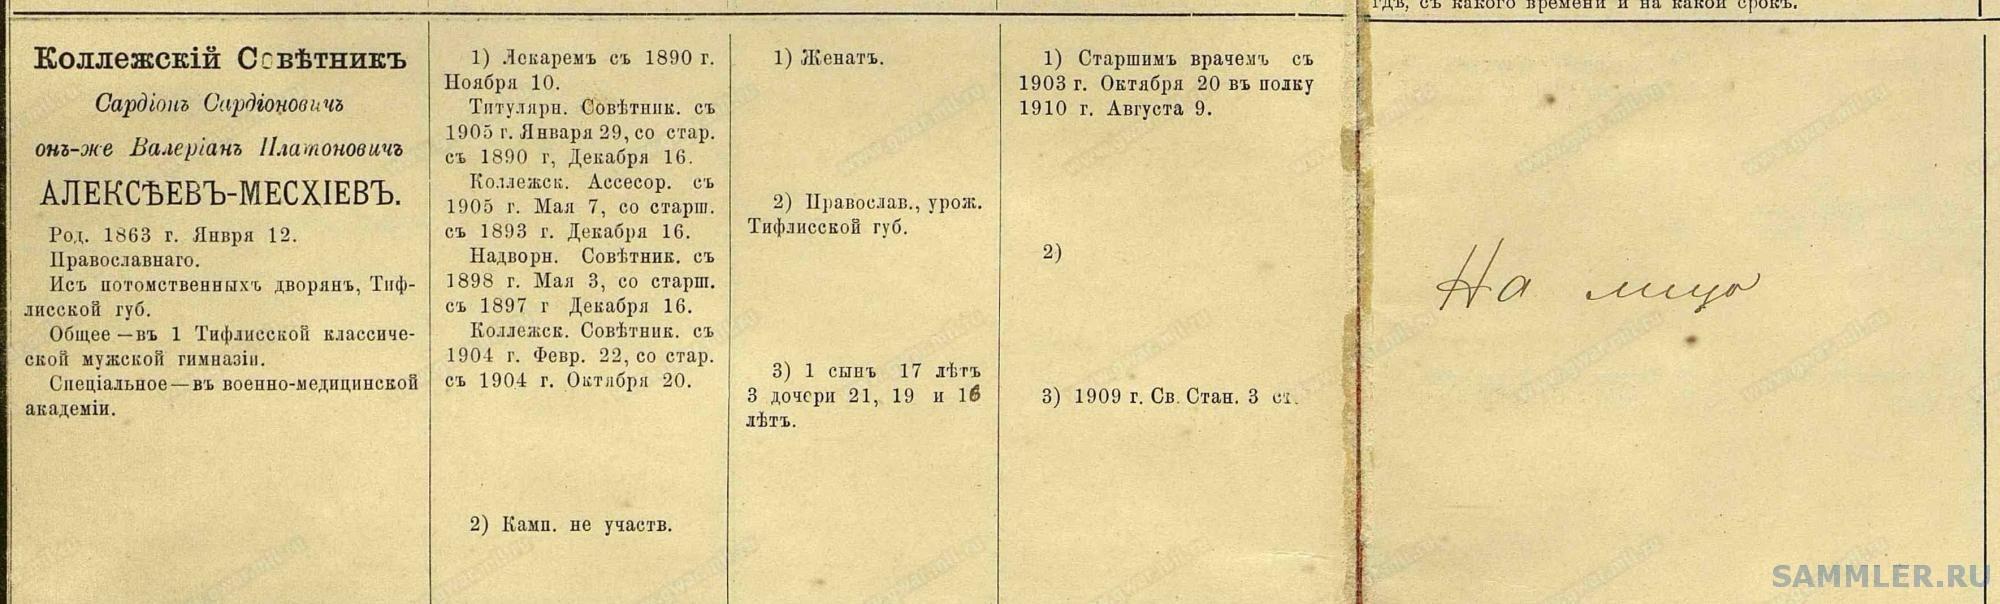 Алексеев-Месхиев С.С.1.jpg